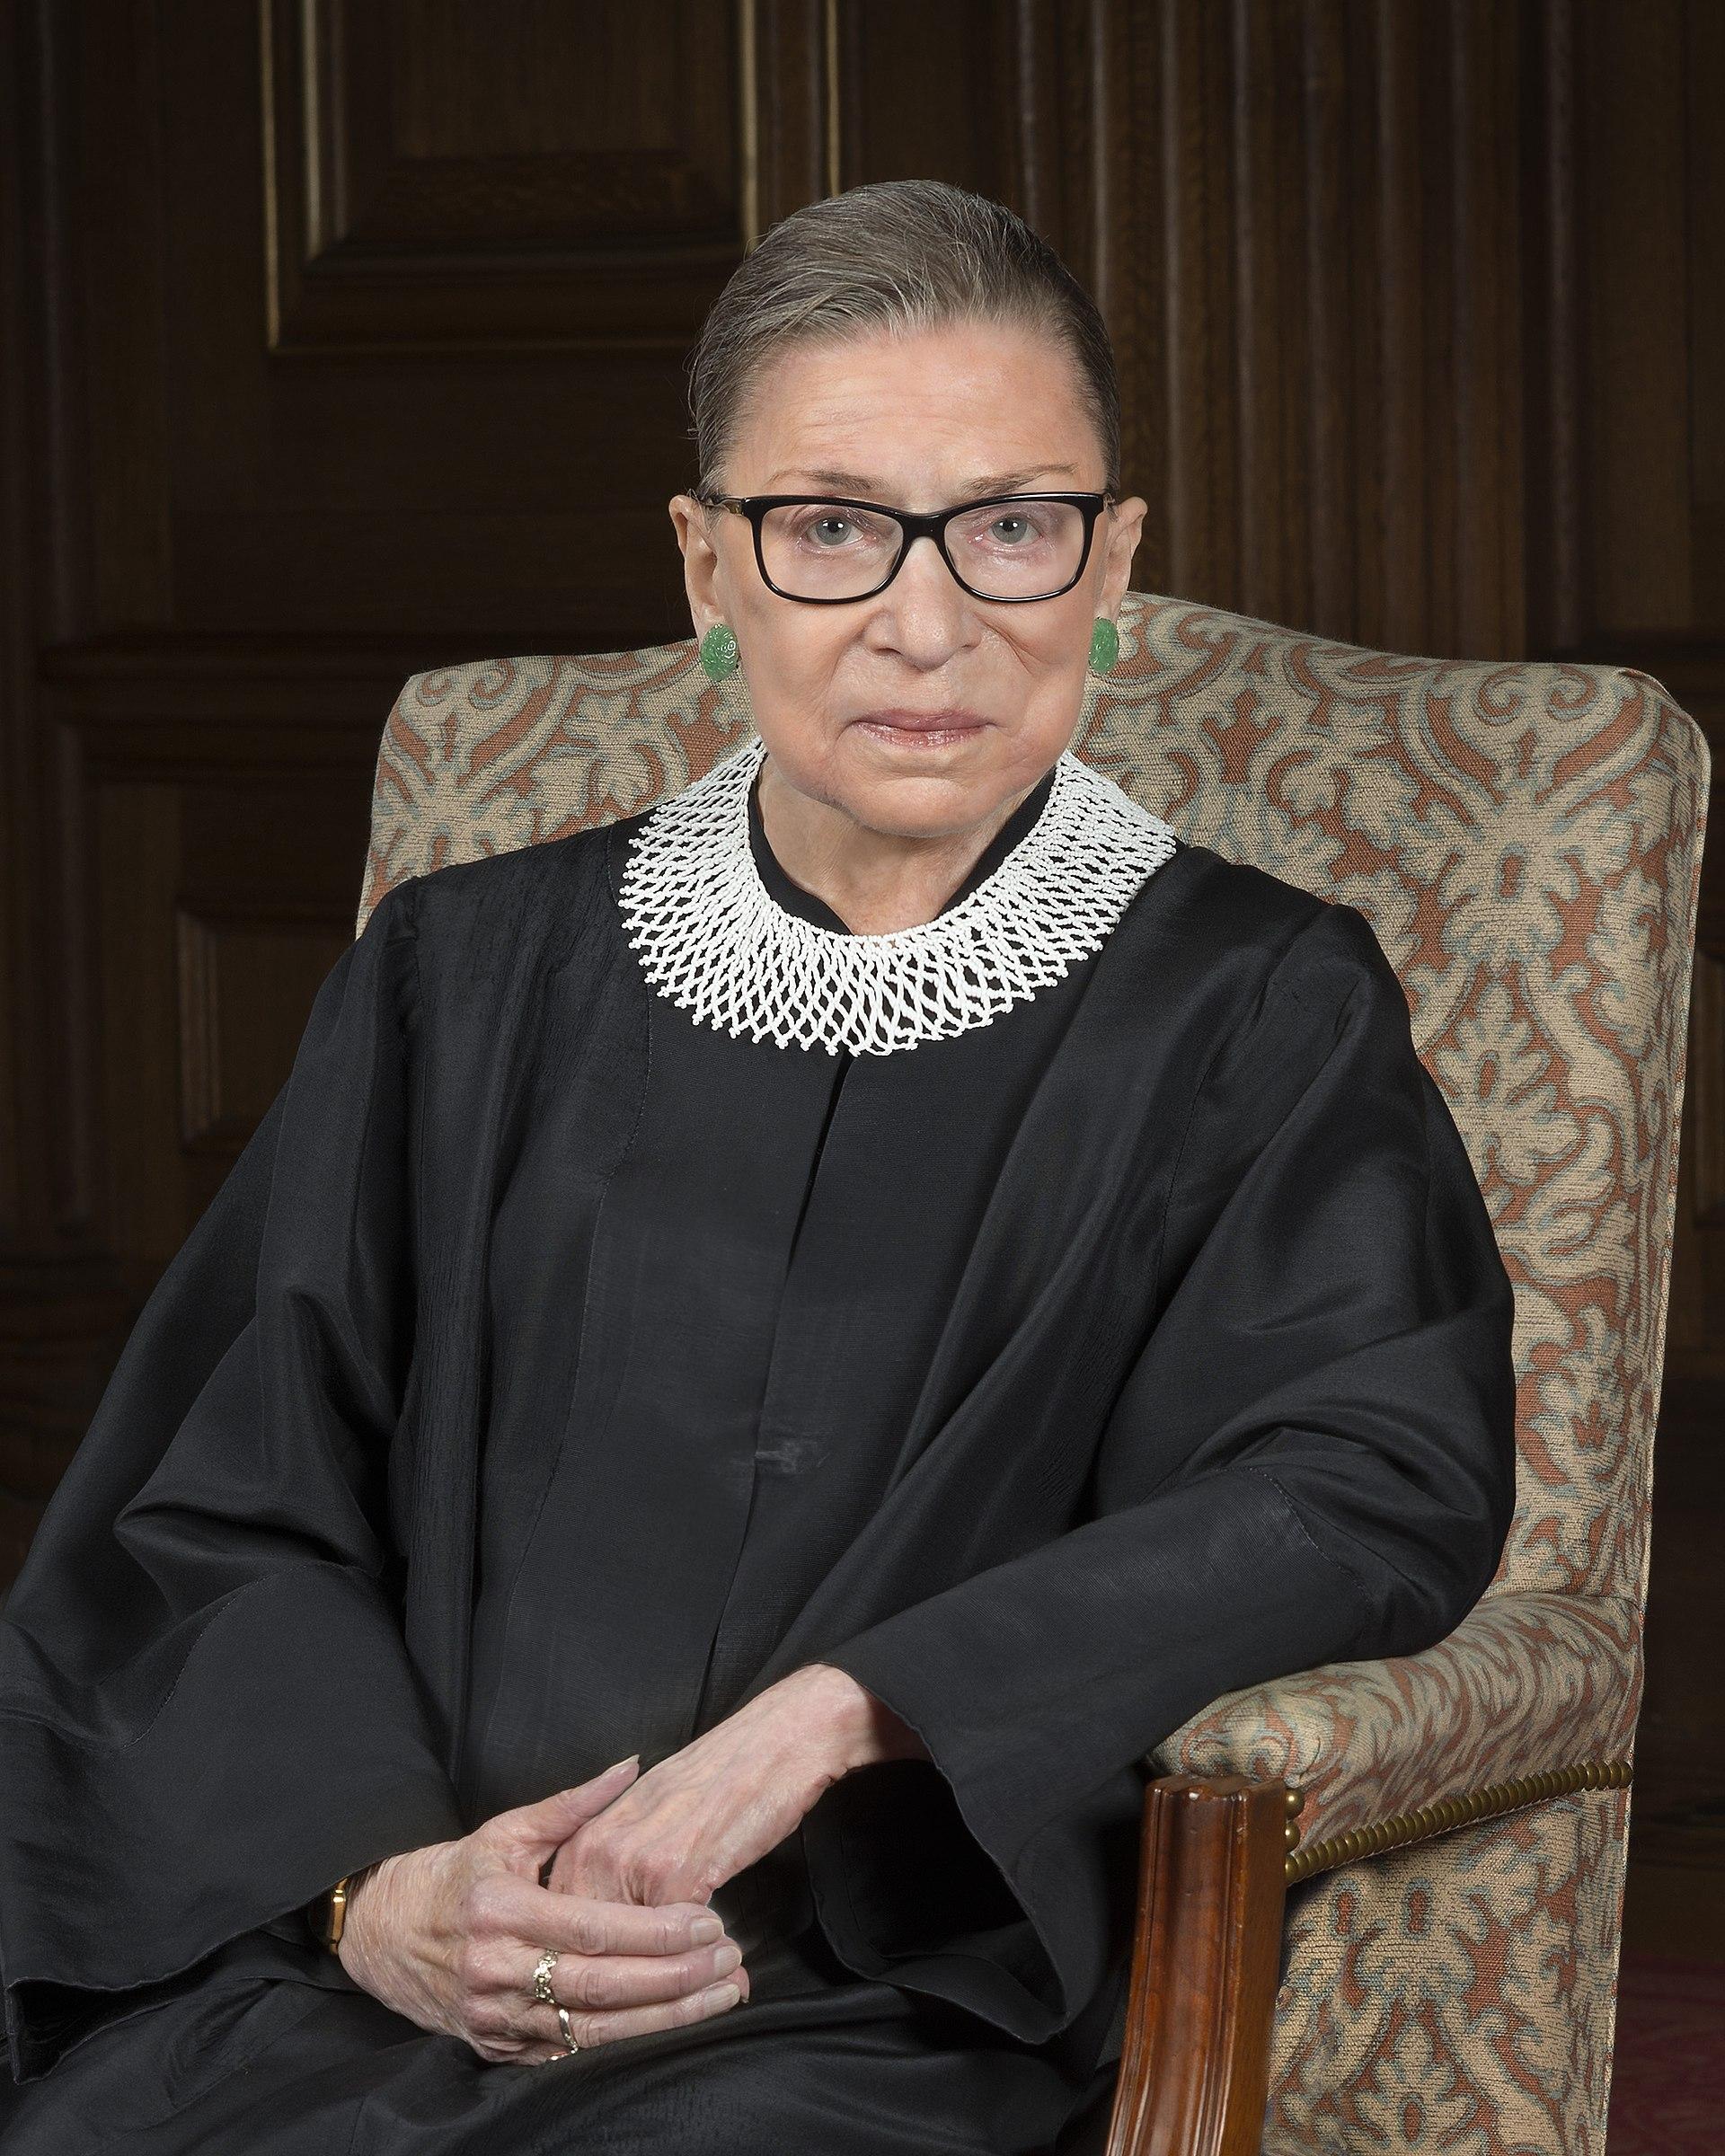 Ruth Bader Ginsburg 2016 portrait.jpg